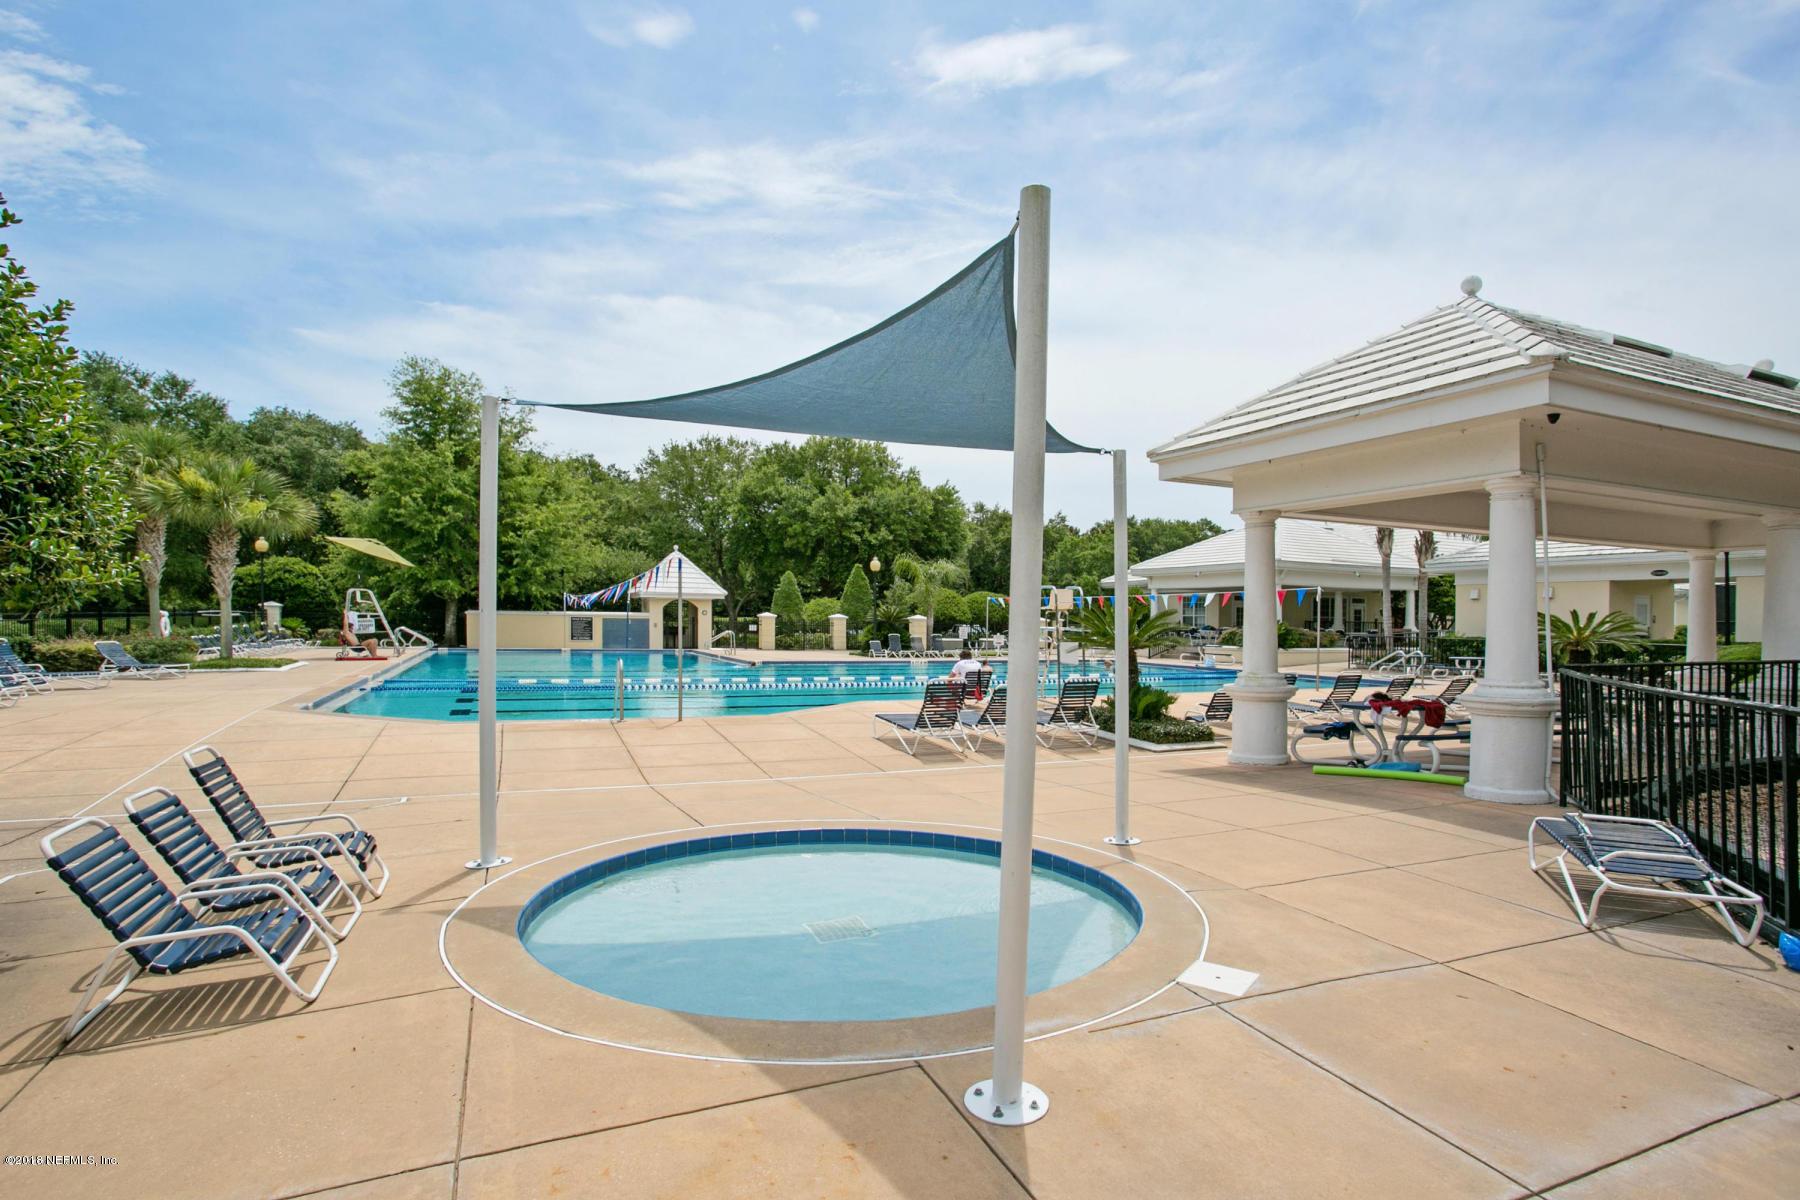 795 PROVIDENCE ISLAND, JACKSONVILLE, FLORIDA 32225, ,Vacant land,For sale,PROVIDENCE ISLAND,928573